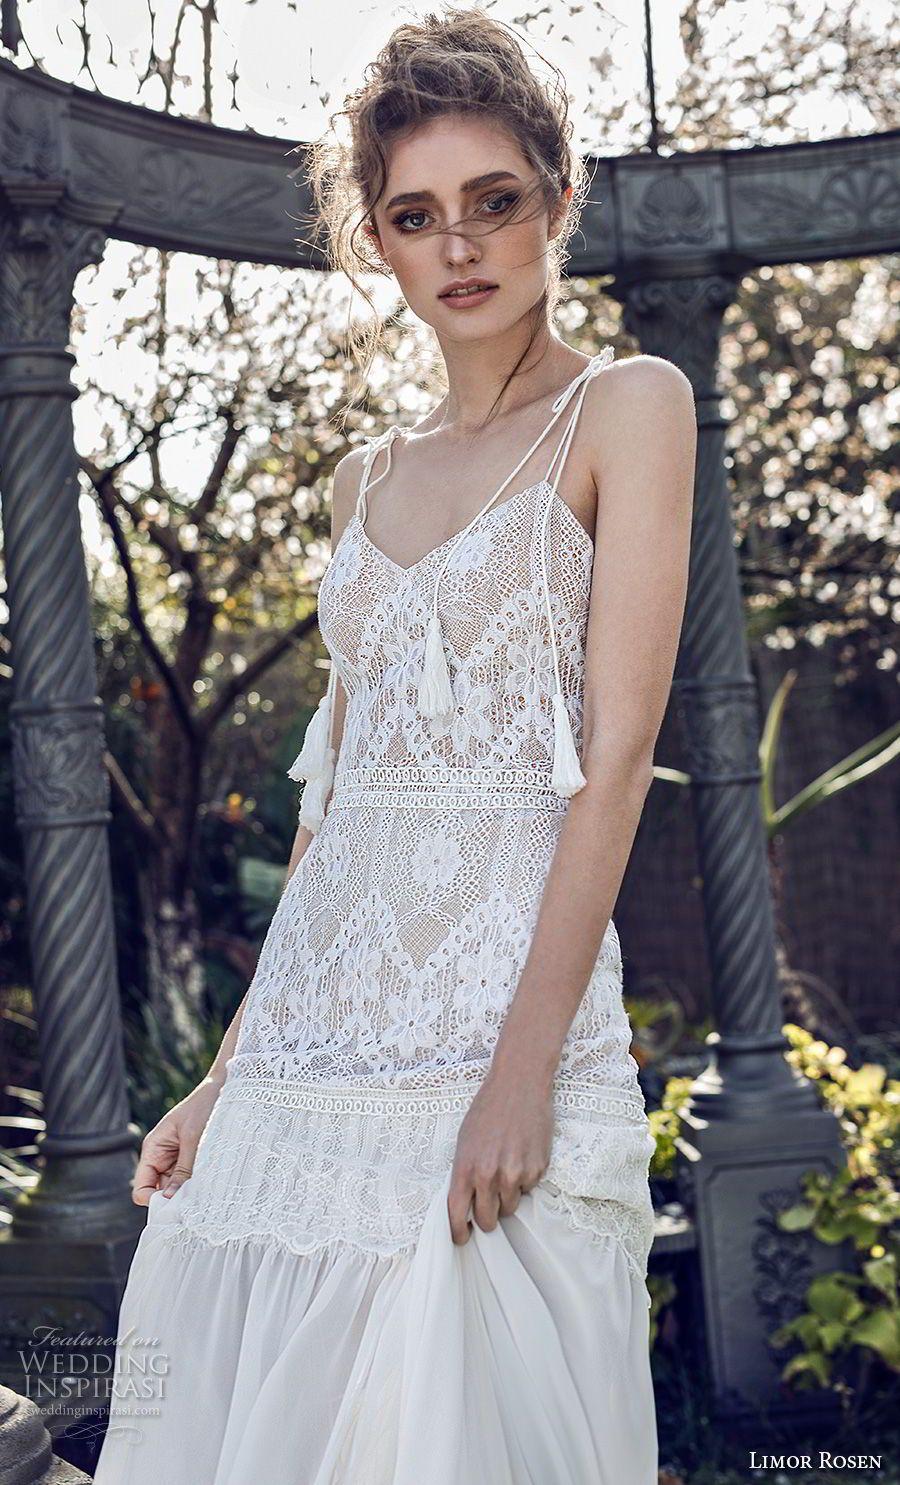 bdc7aa83f05 limor rosen 2019 xo bridal sleeveless spaghetti strap diamond neckline  heavily embellished bodice bohemian modified a line wedding dress open back  vhapel ...